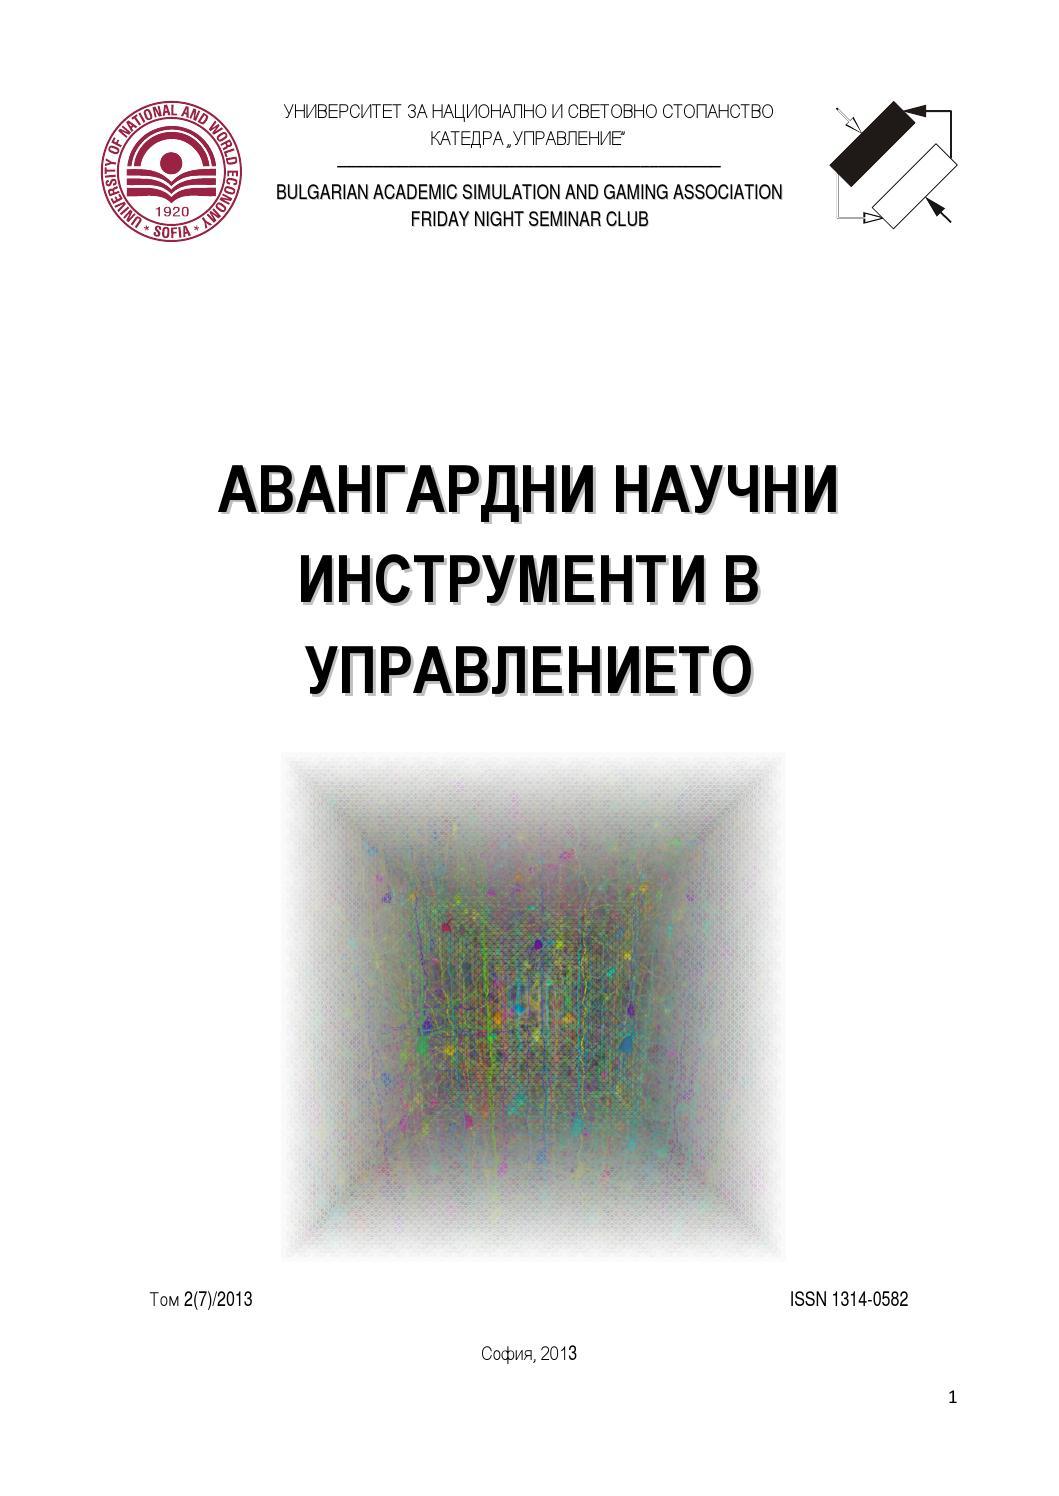 Vanguard Scientific Instruments In Management Volume 2 7 2013